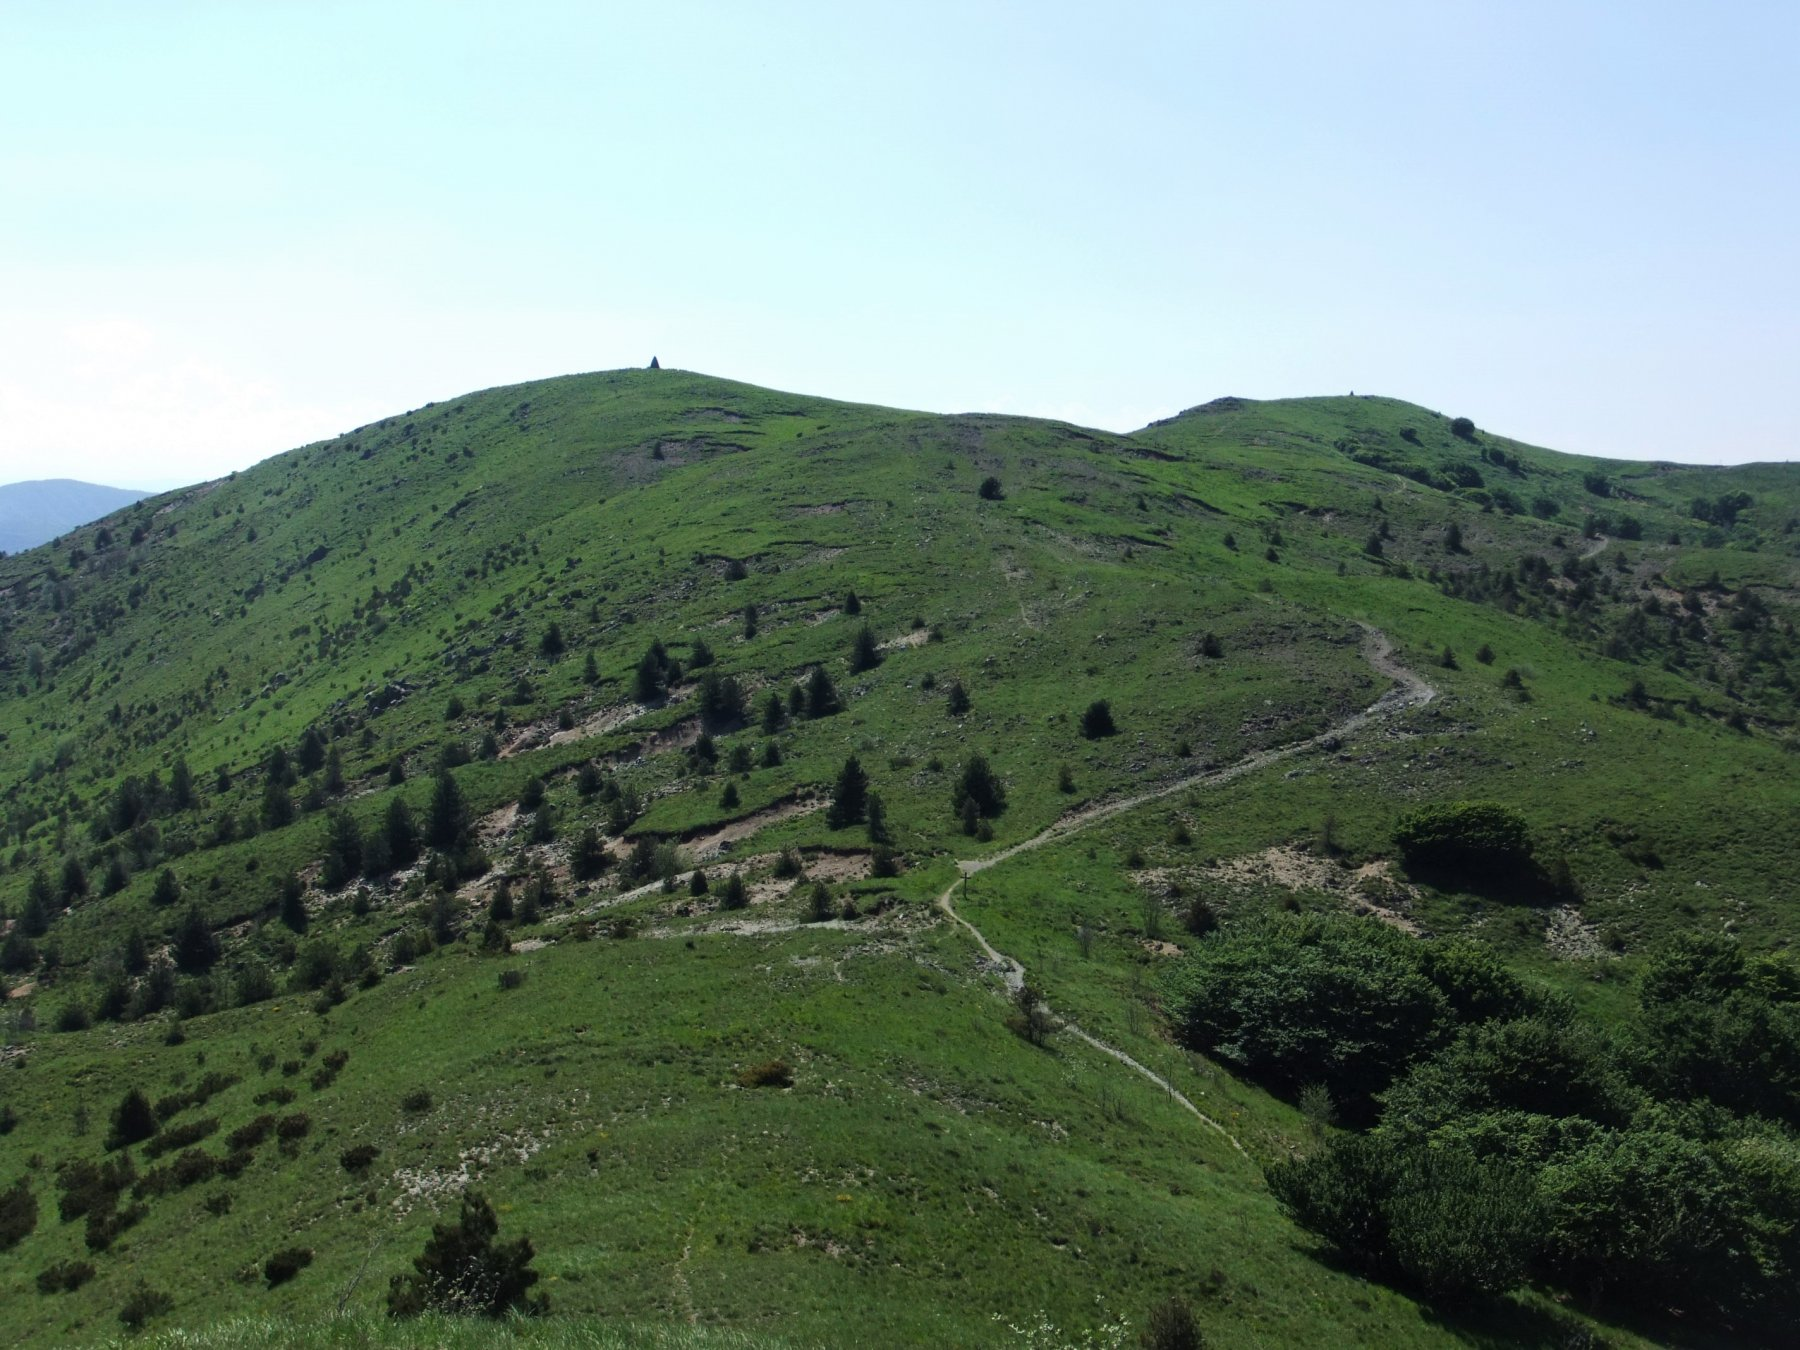 Le due cime del Pracaban viste dal Bric Nascio